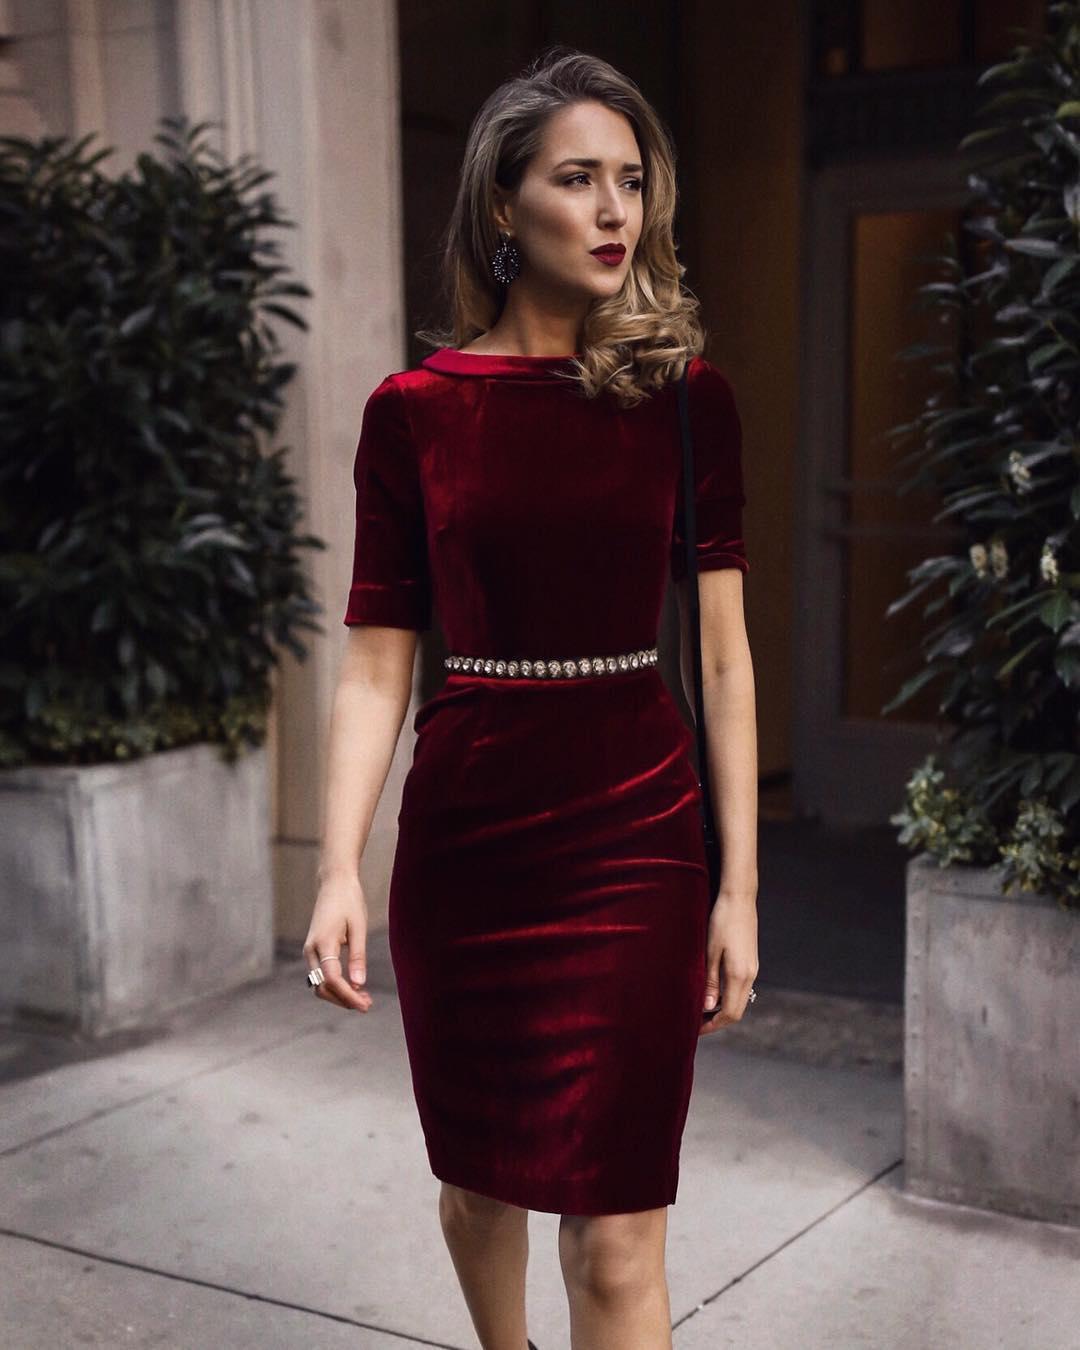 Бархатное платье 2020 фото 2